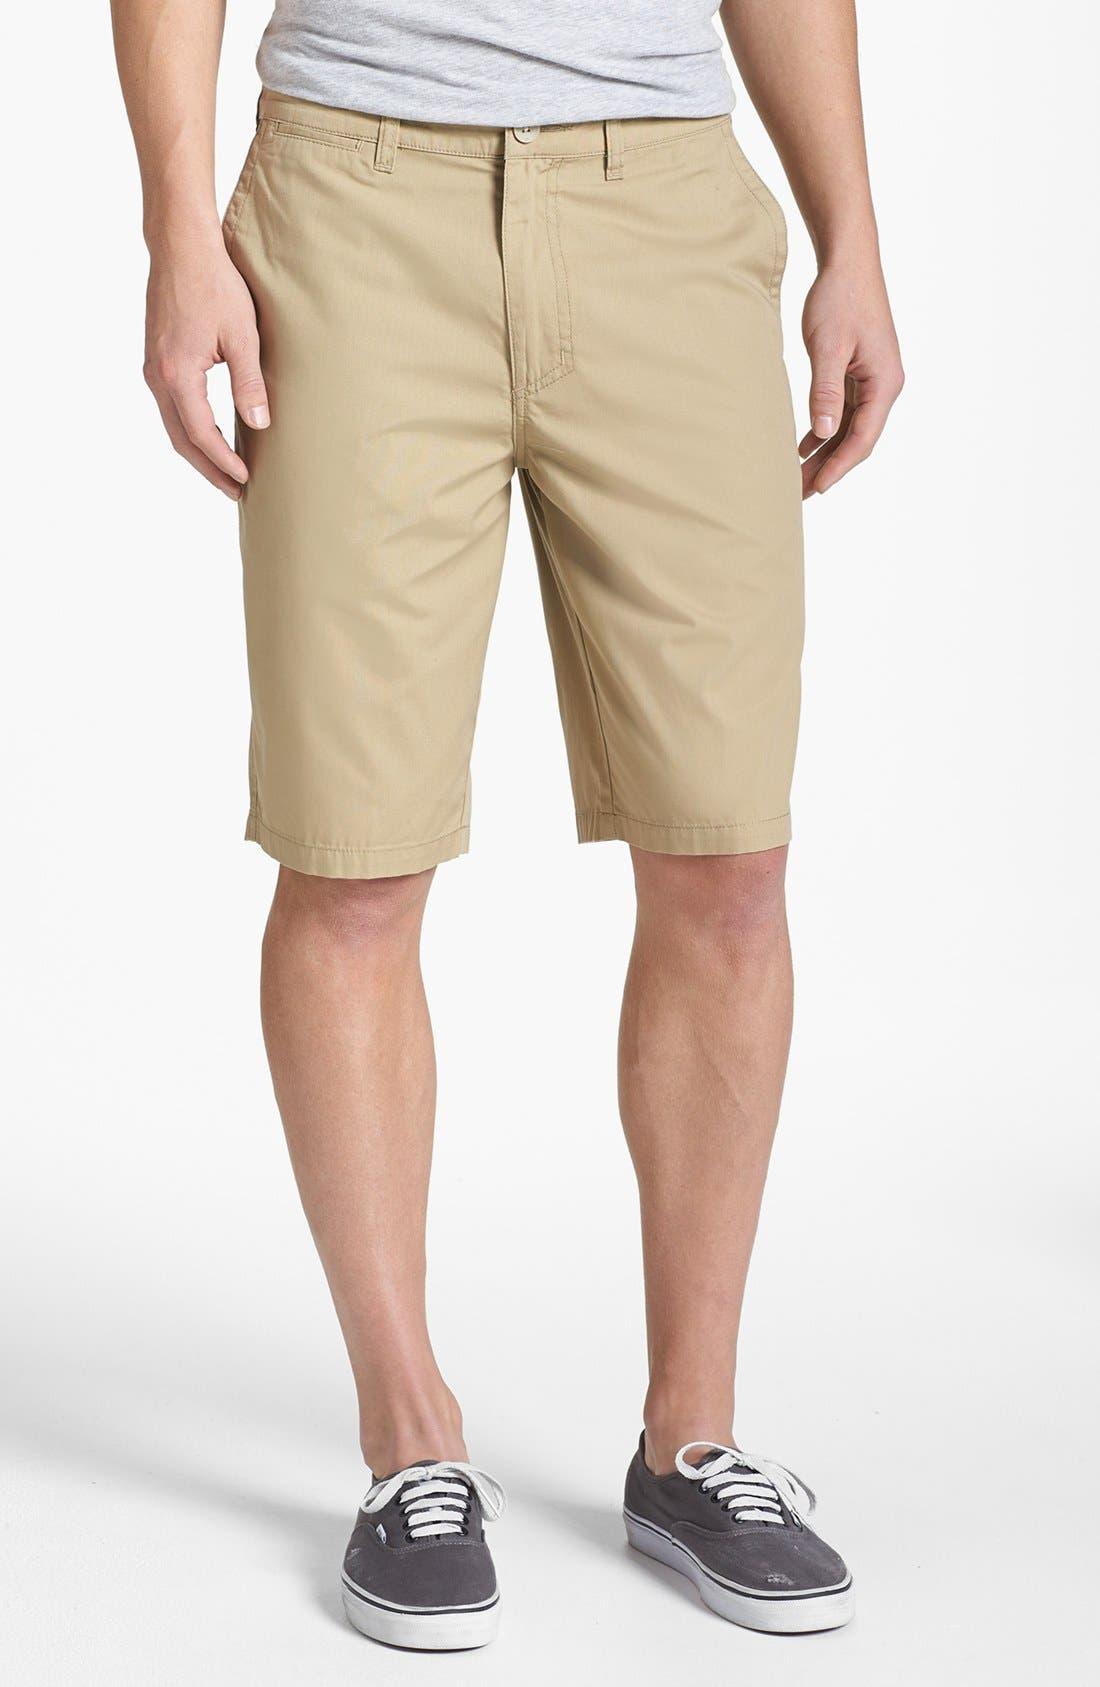 Alternate Image 1 Selected - Quiksilver 'Rockefeller' Shorts